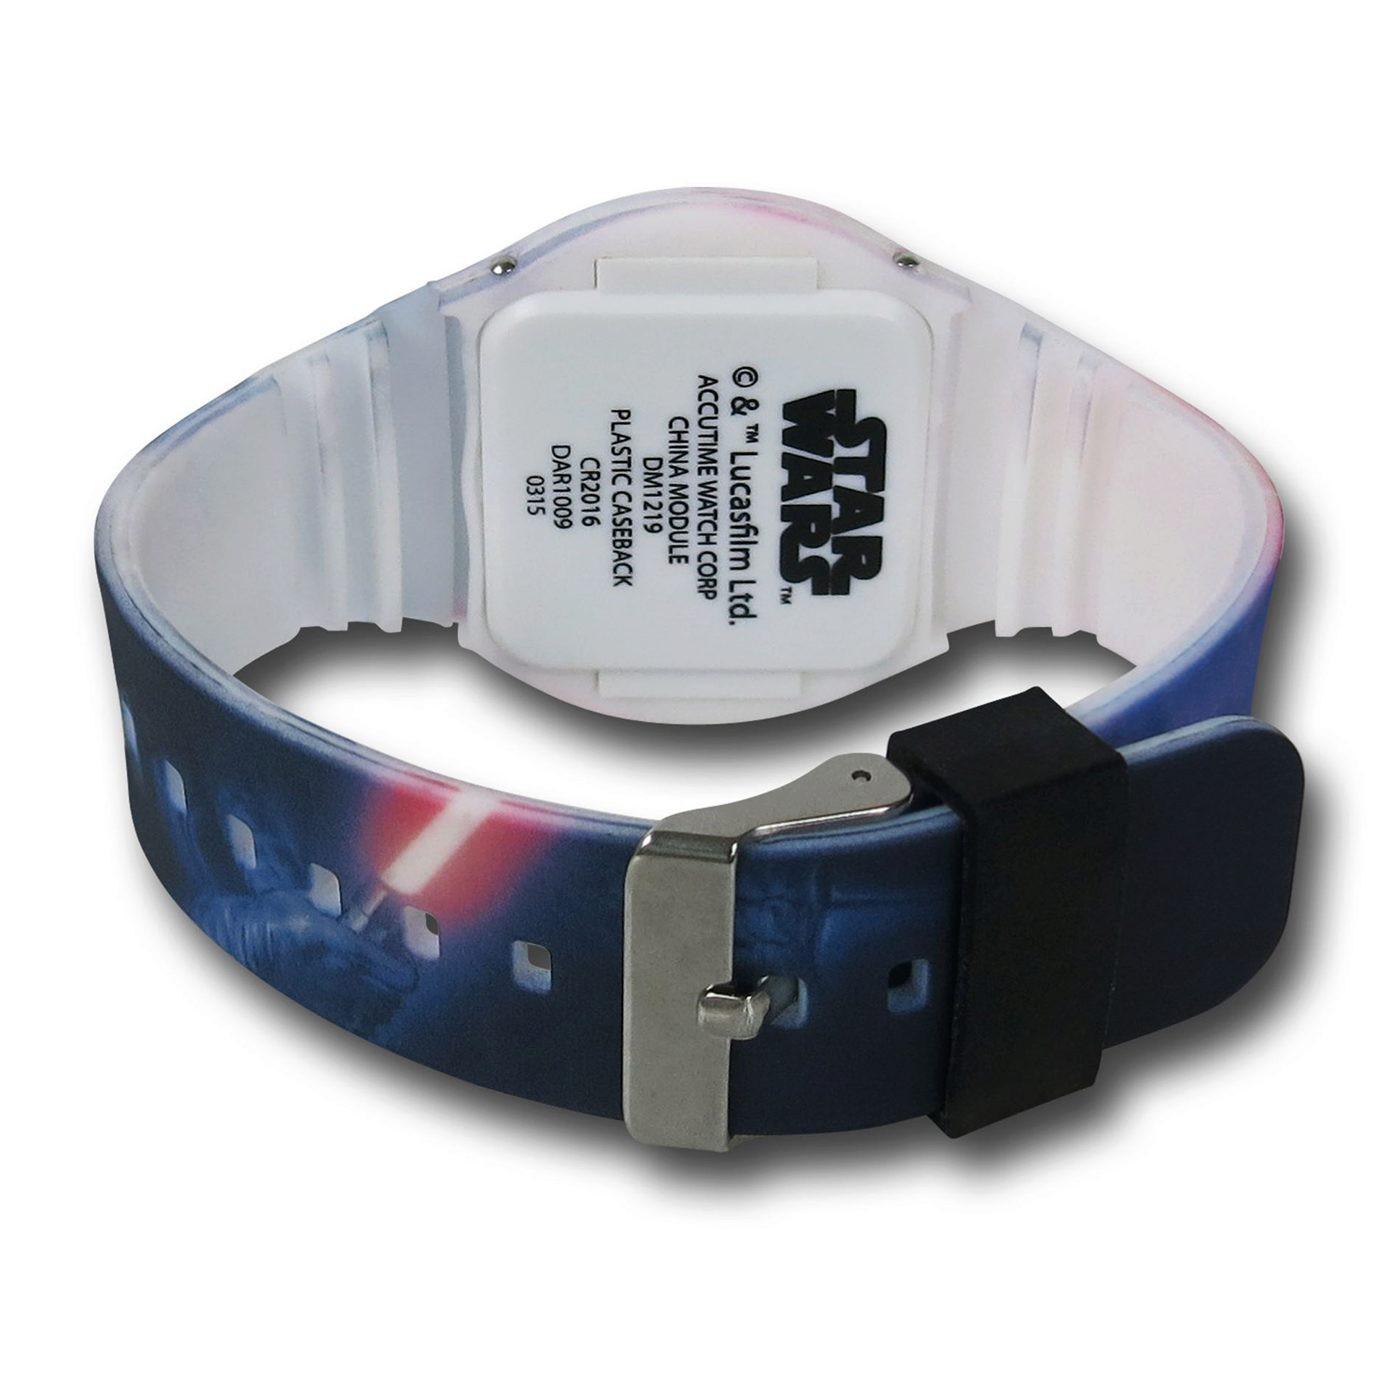 Star Wars Vader LED Watch